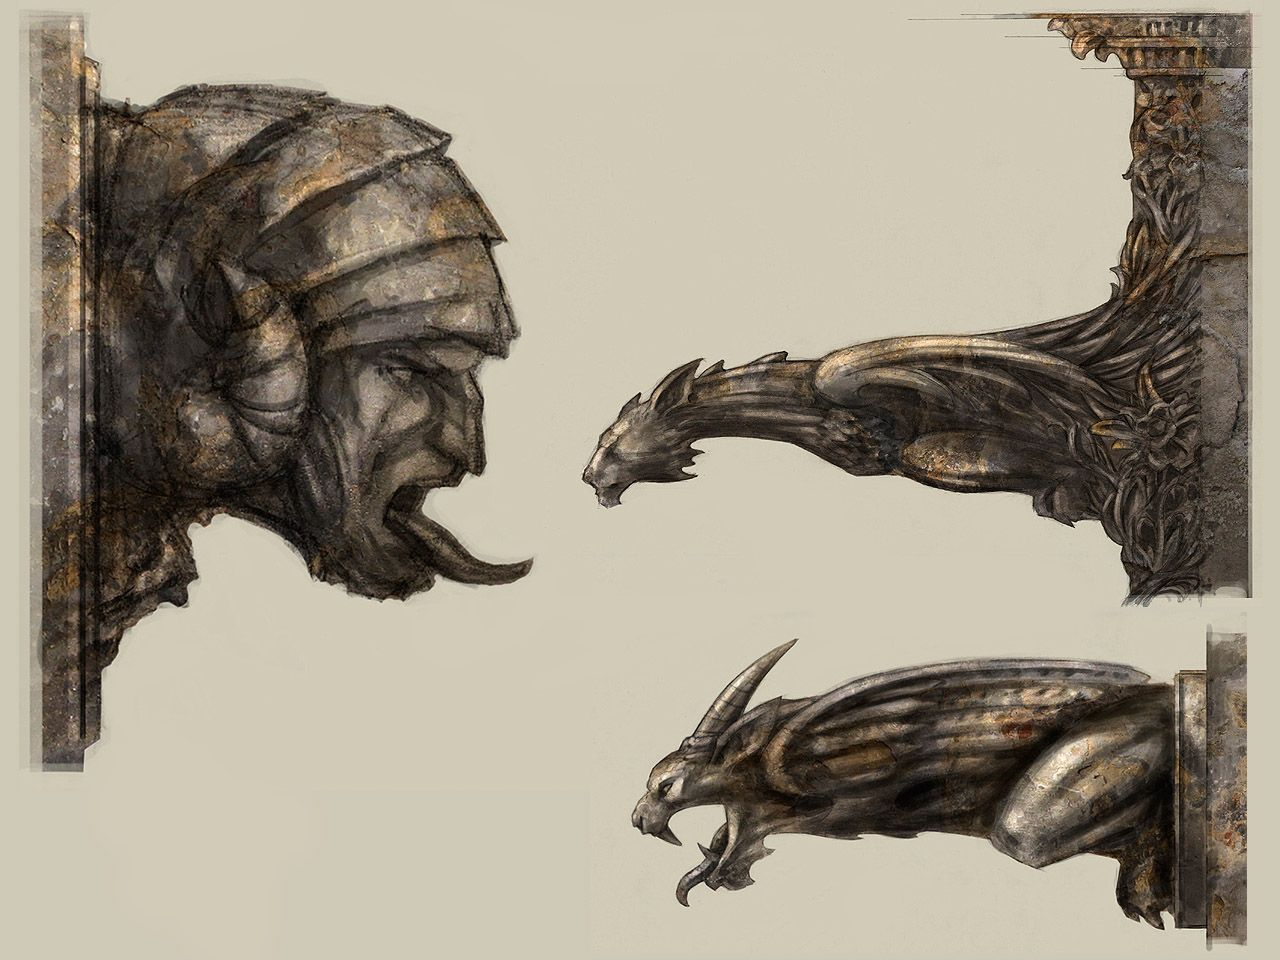 Wheelman™ Gargoyles Gargoyles art, Gargoyle drawing